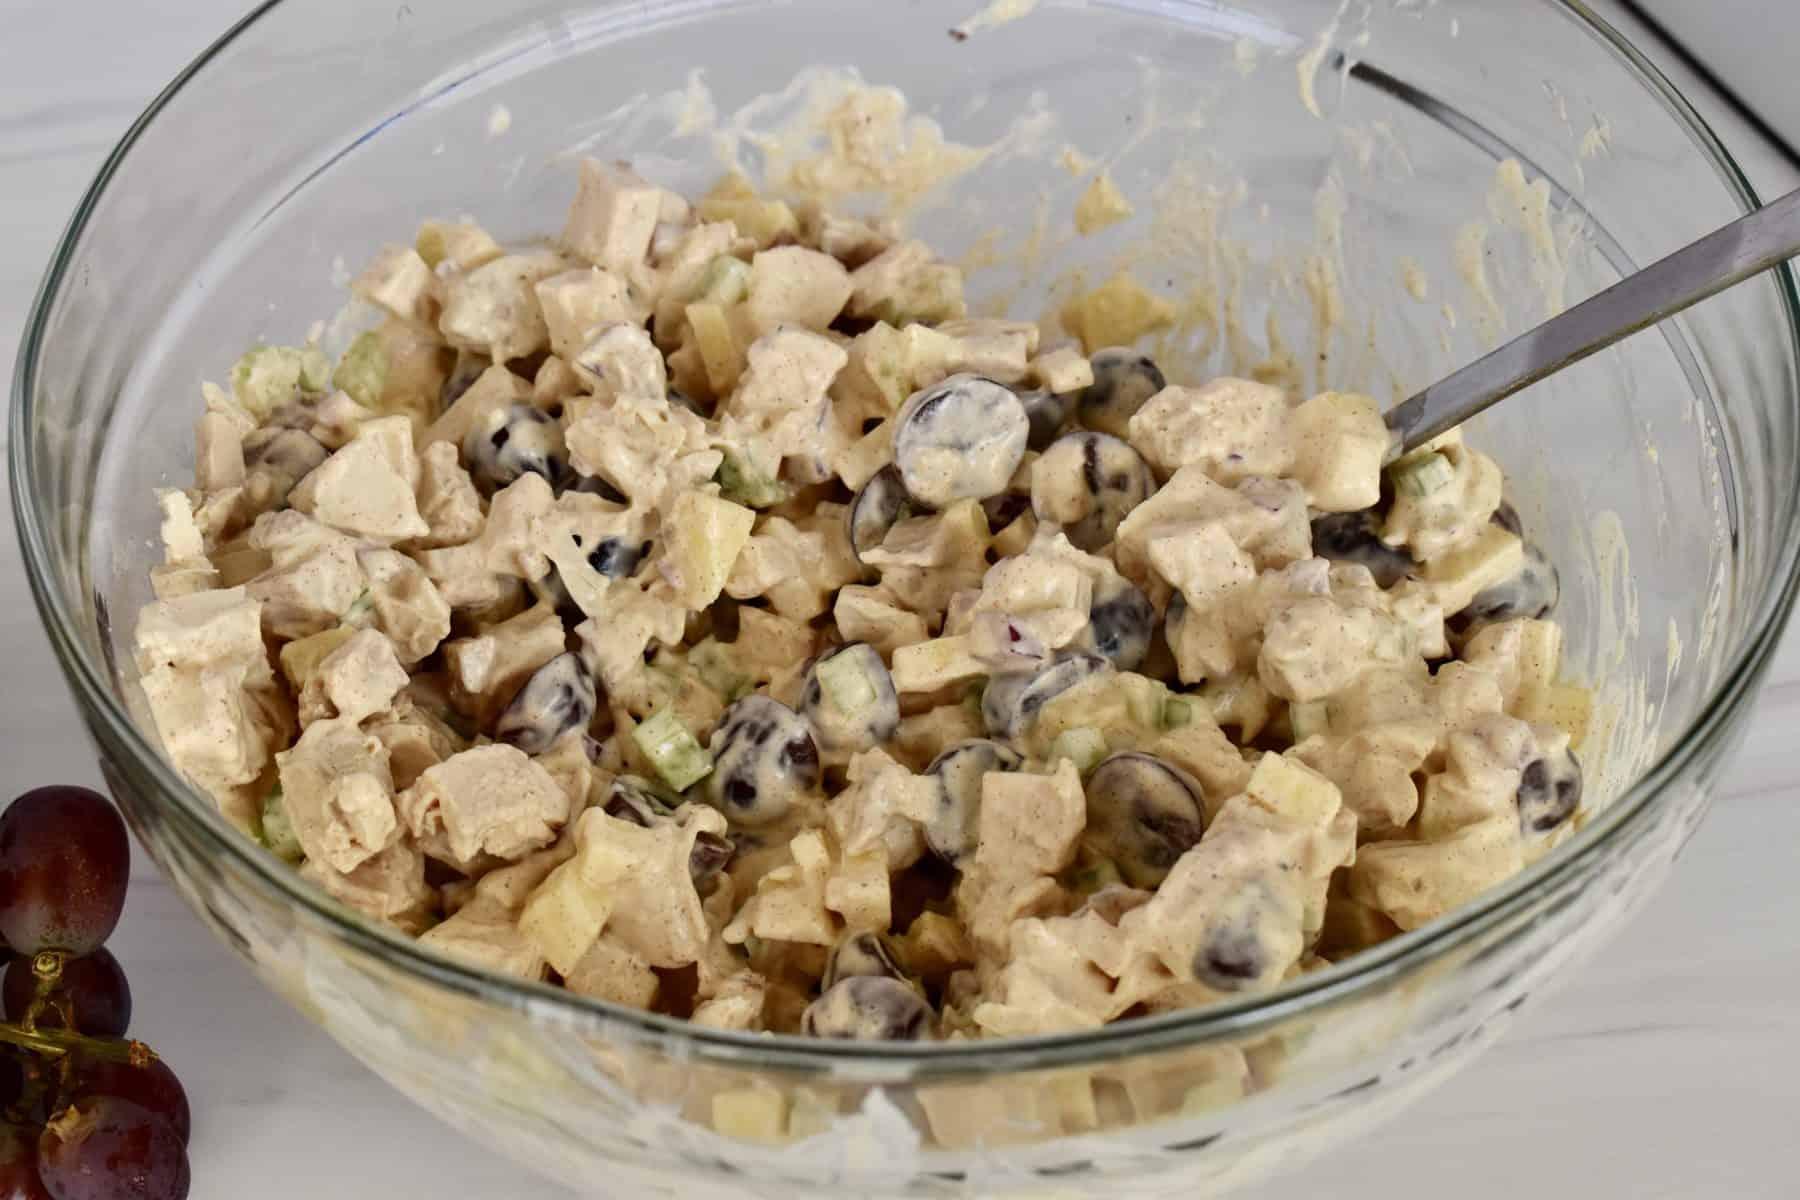 rotisserie chicken salad in a glass bowl.